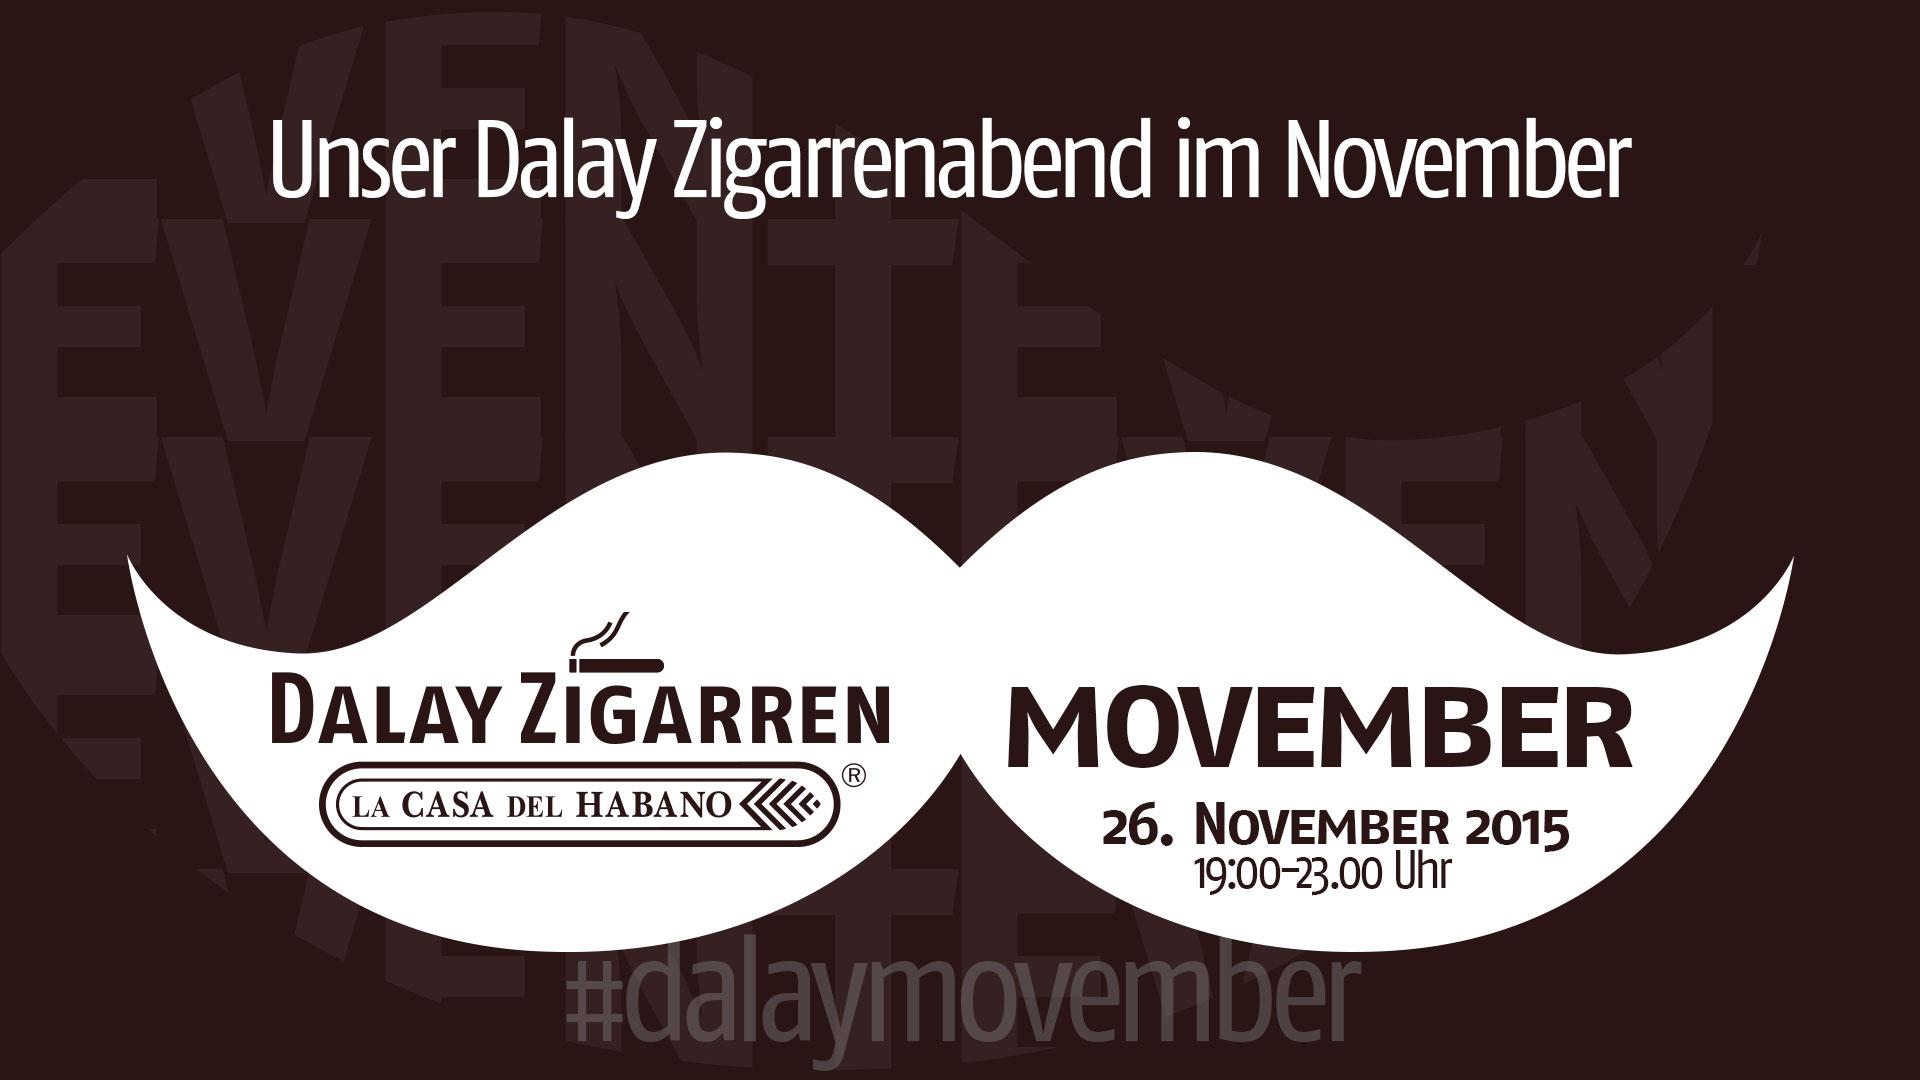 Dalay Zigarrenabend Movember